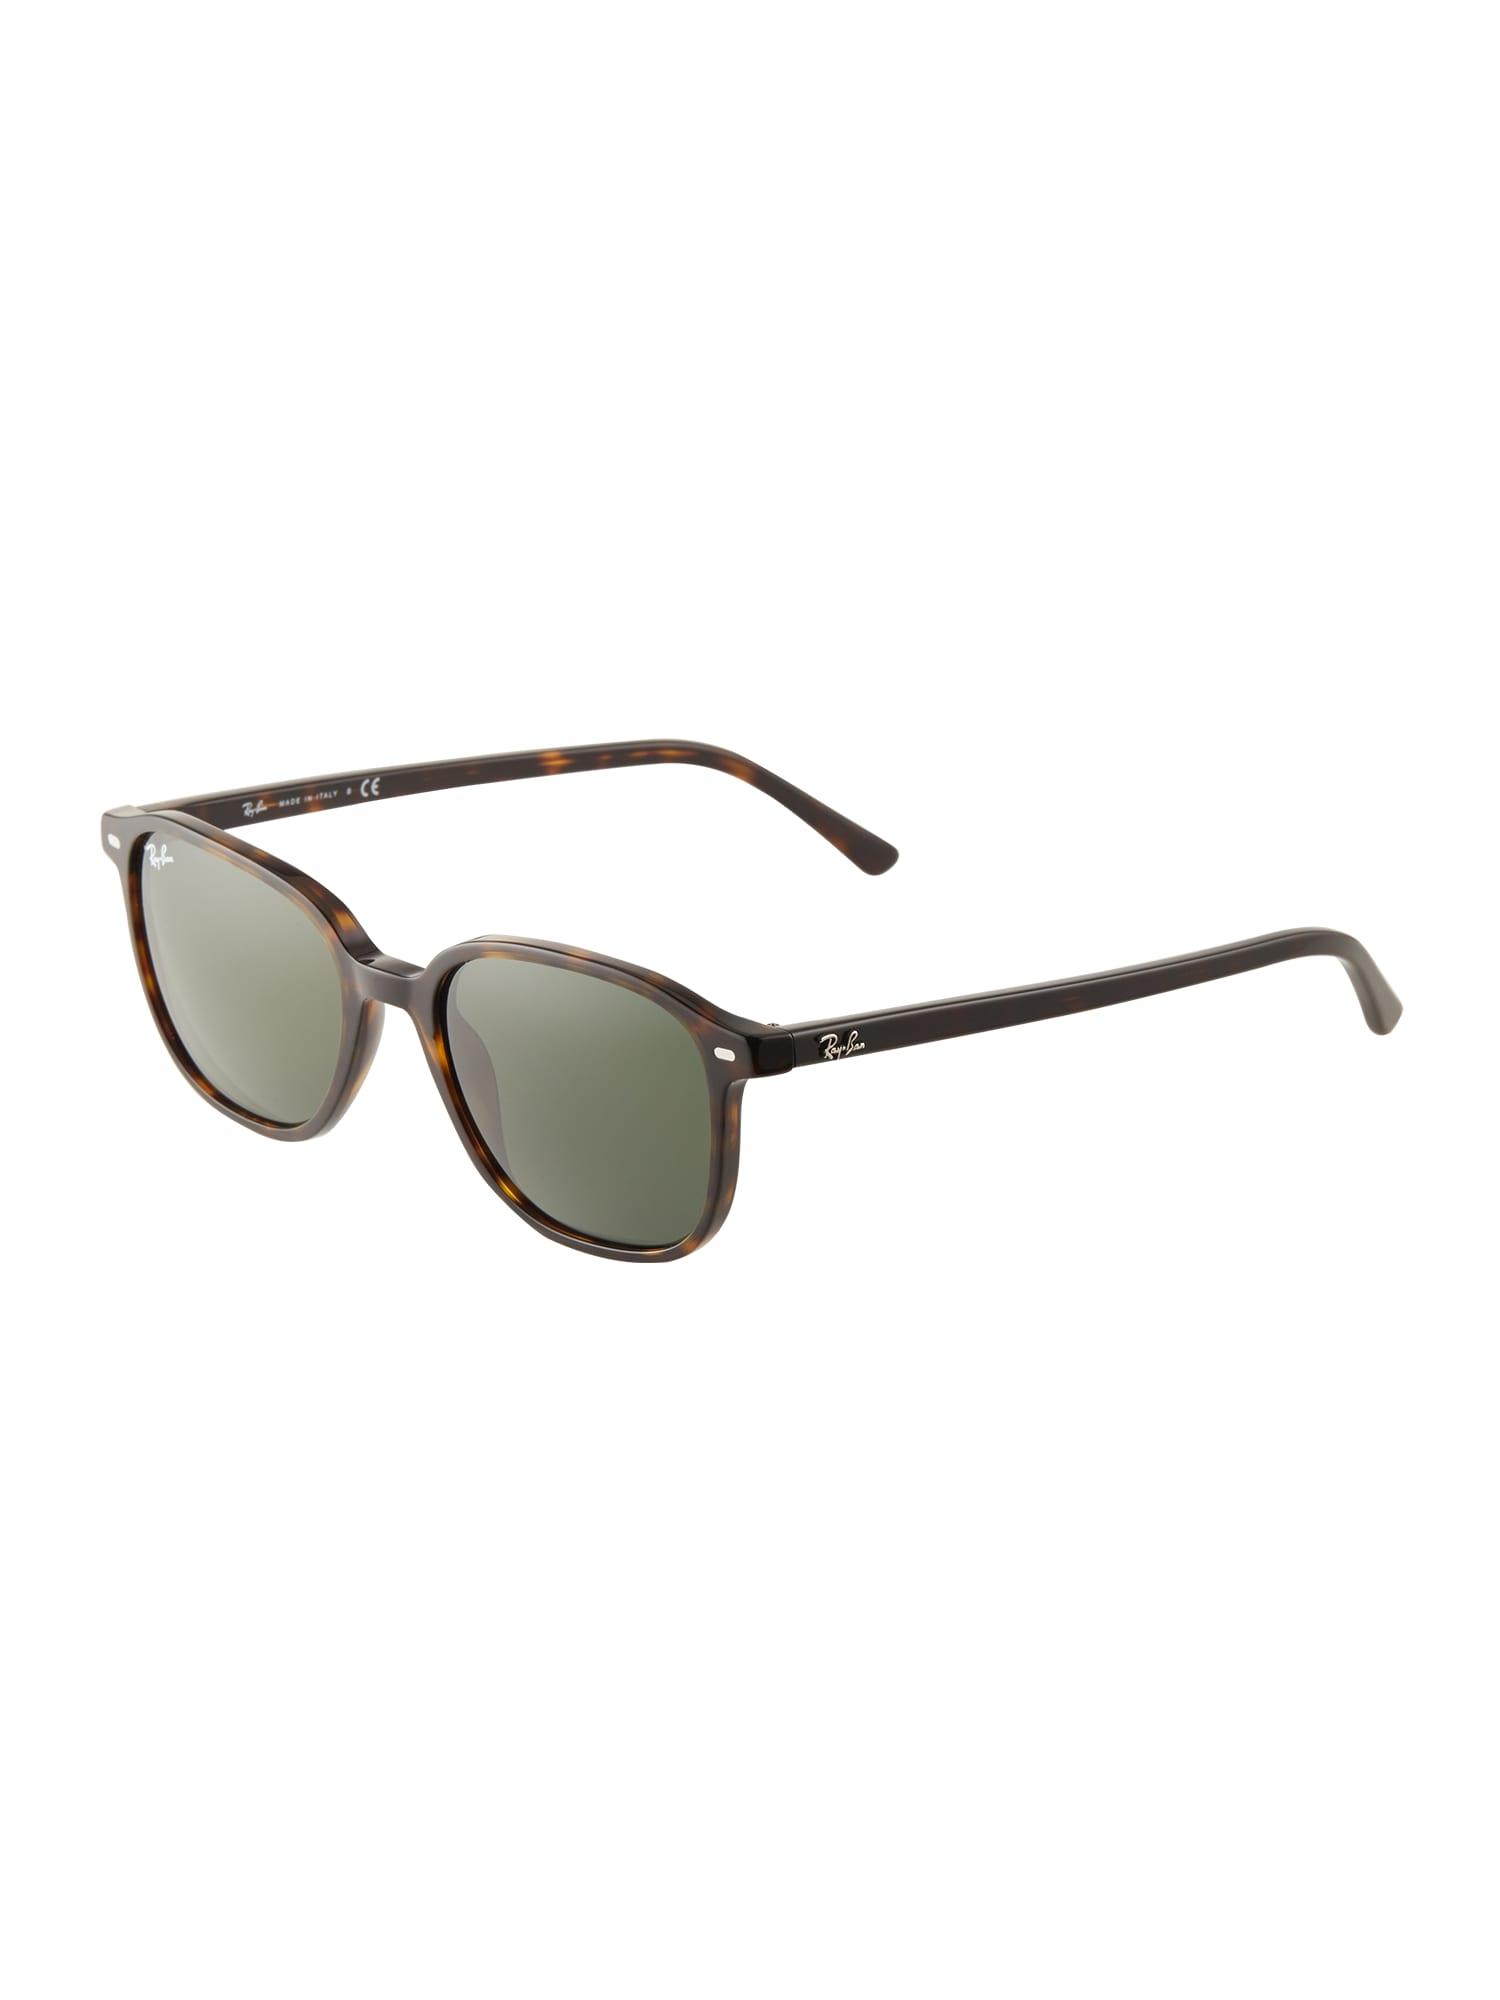 ray-ban occhiali da sole '0rb2193' marrone